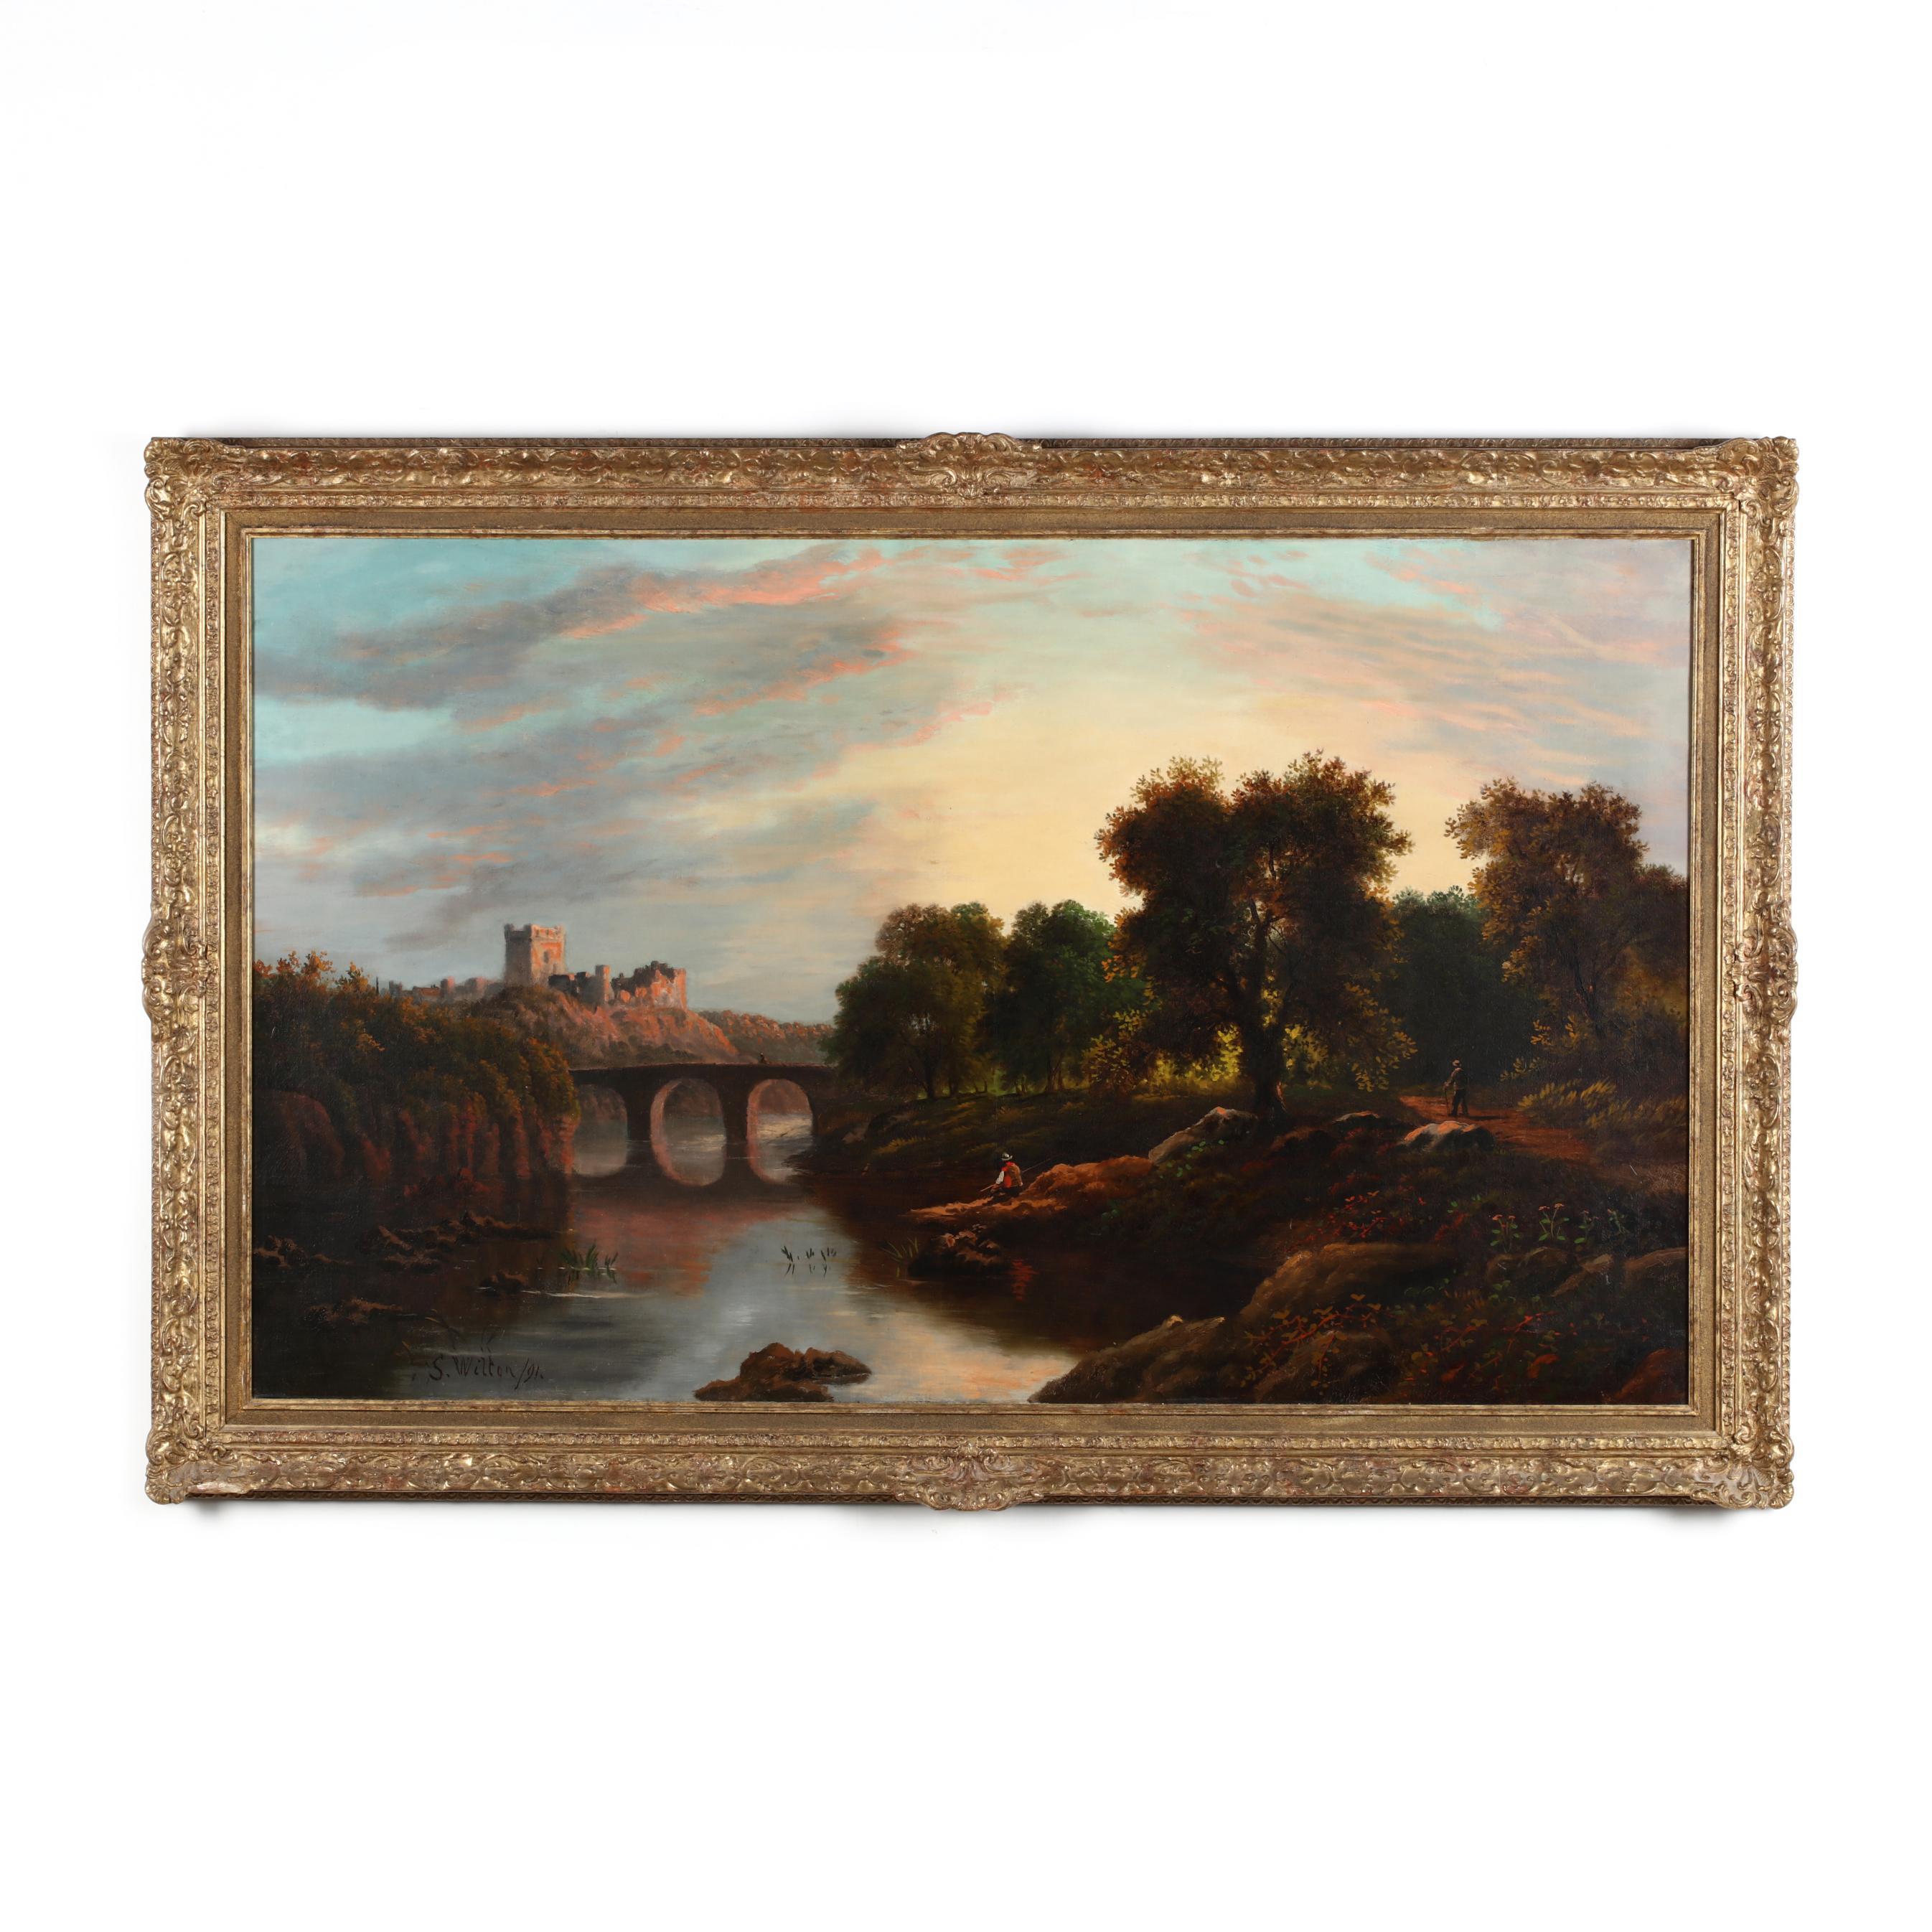 s-wilton-british-19th-century-i-view-of-richmond-castle-yorkshire-i